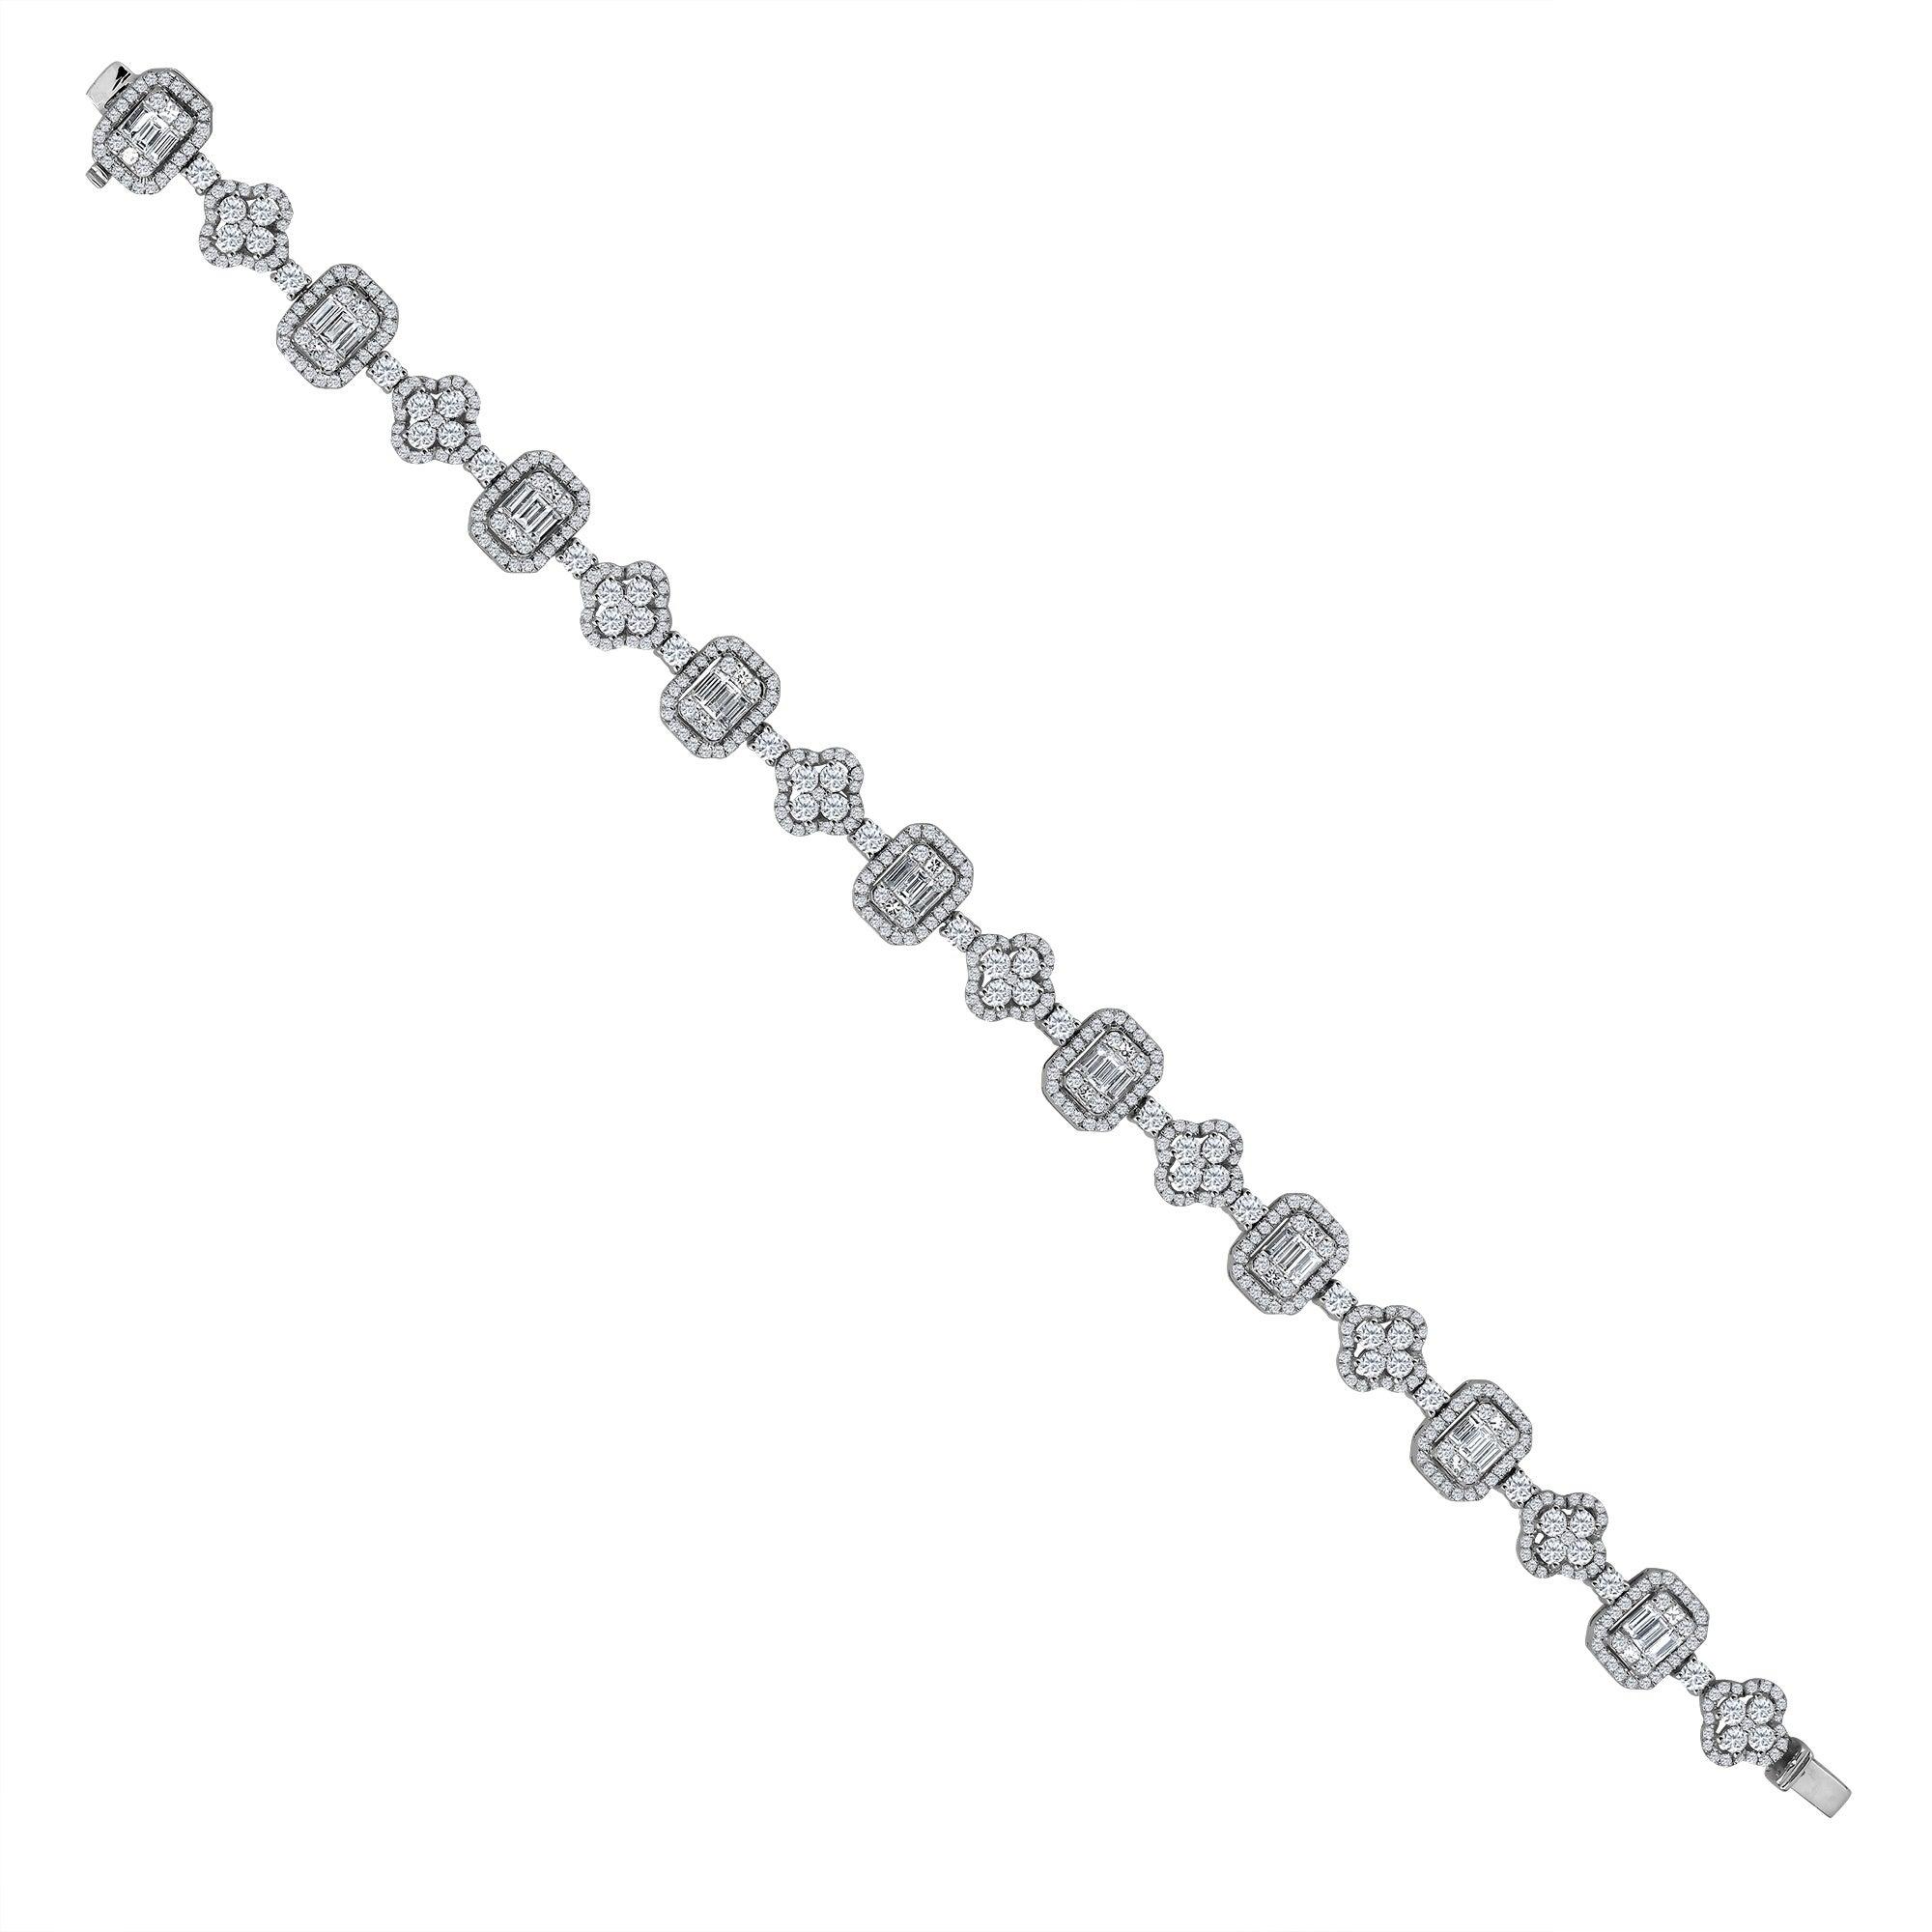 Emilio Jewelry 4.47 Carat Diamond Bracelet